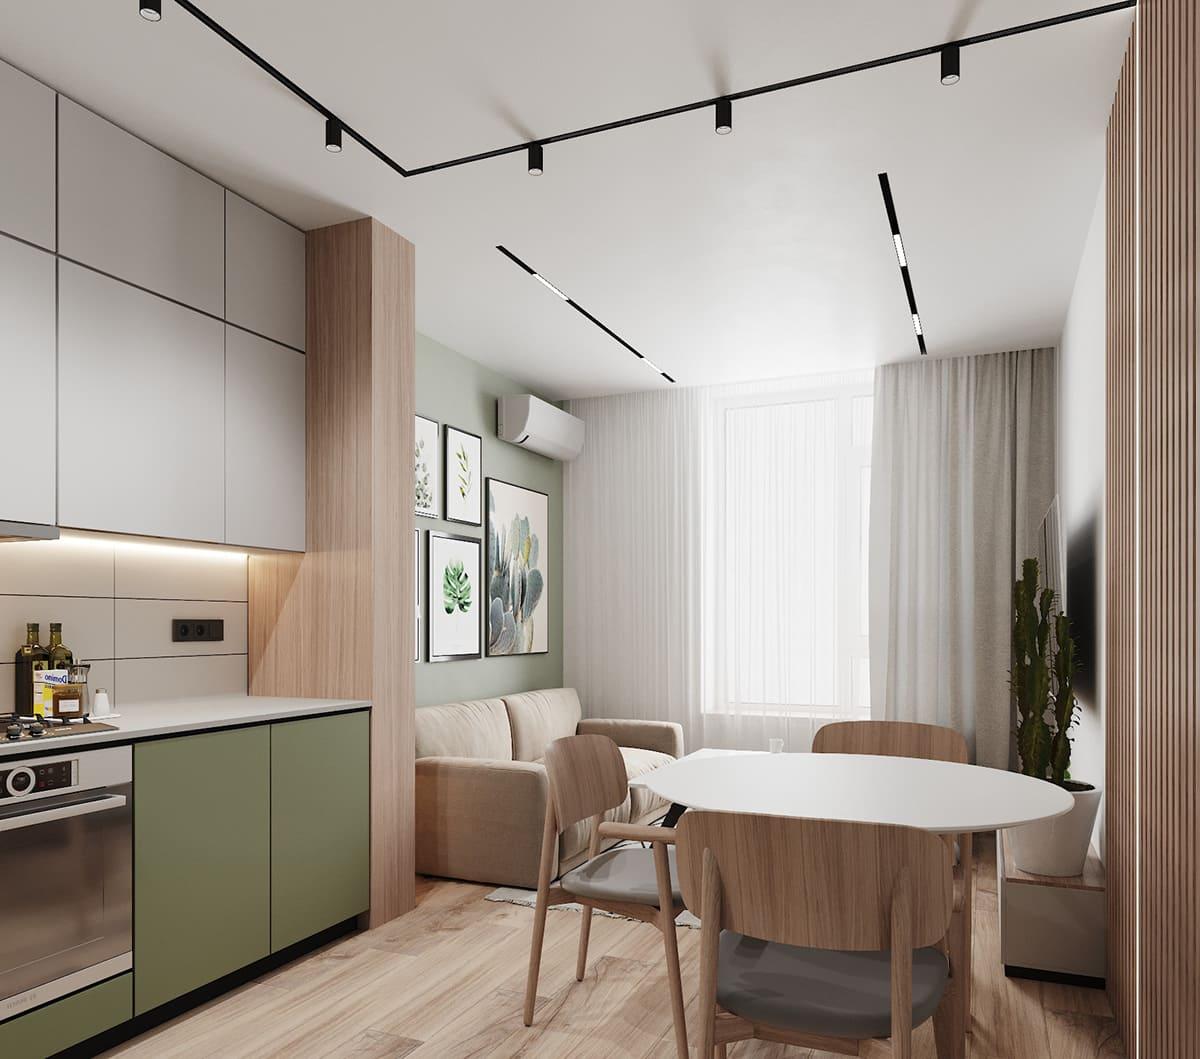 дизайн интерьера модной квартиры фото 86